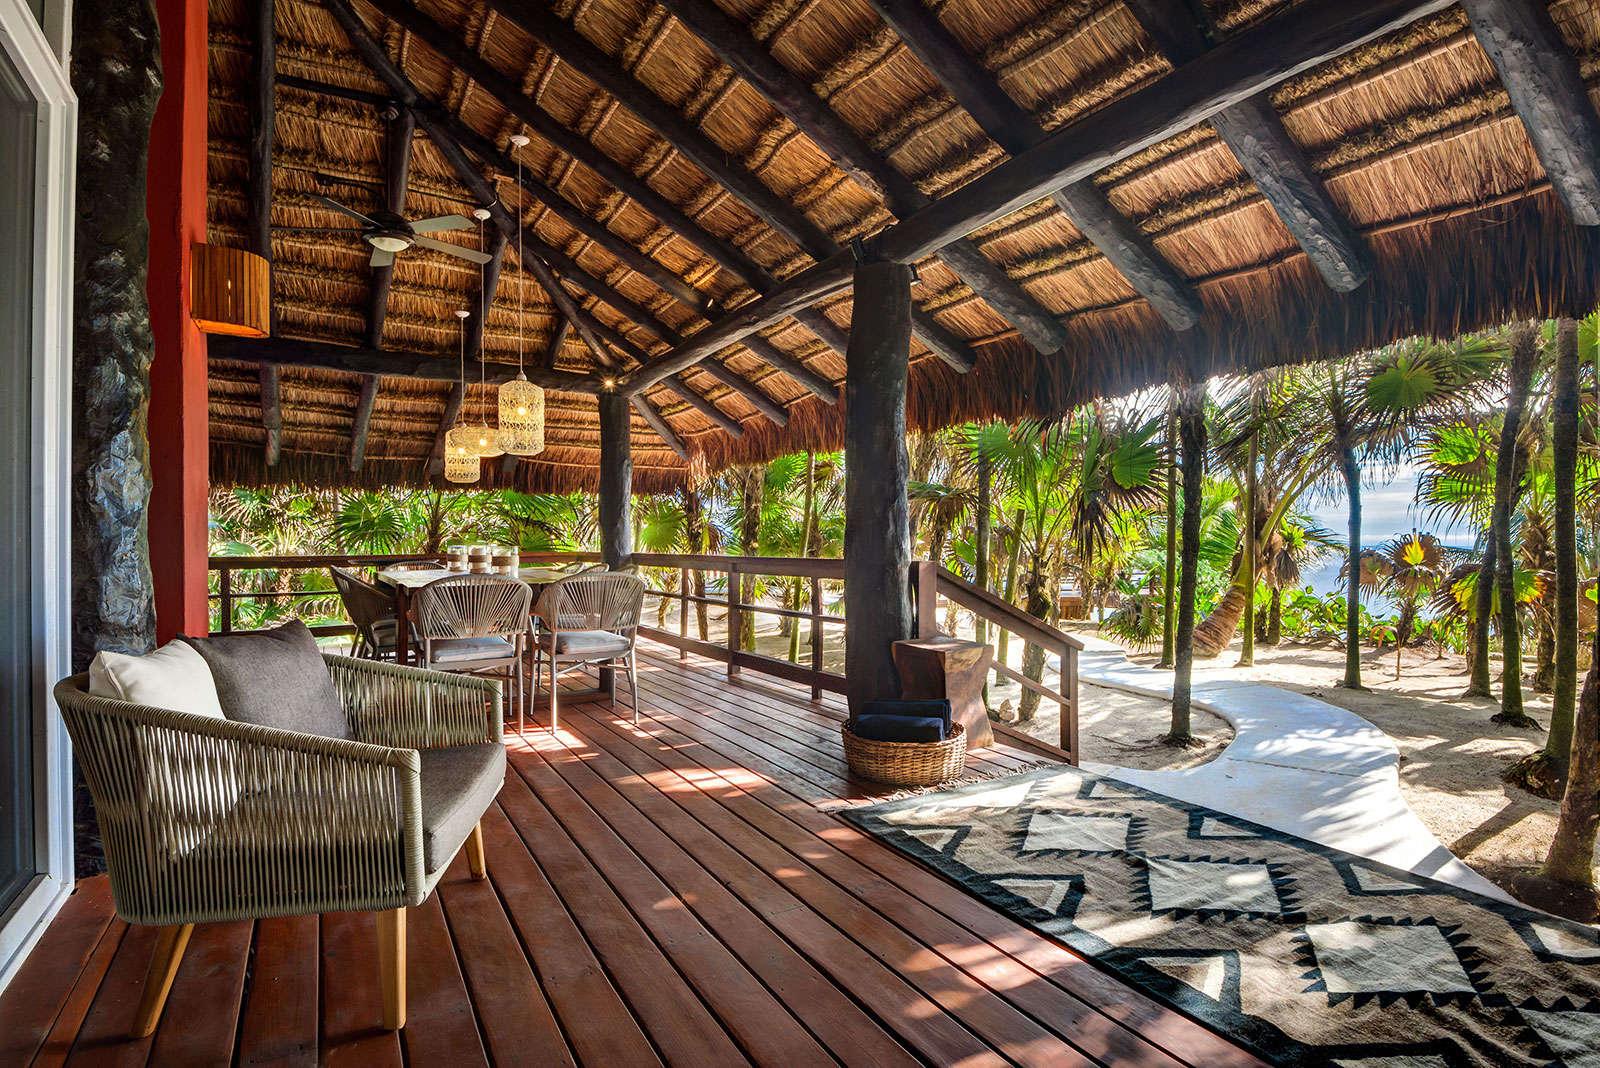 Luxury vacation rentals mexico - Riviera maya - Sian ka an - No location 4 - Casa Godi - Image 1/43